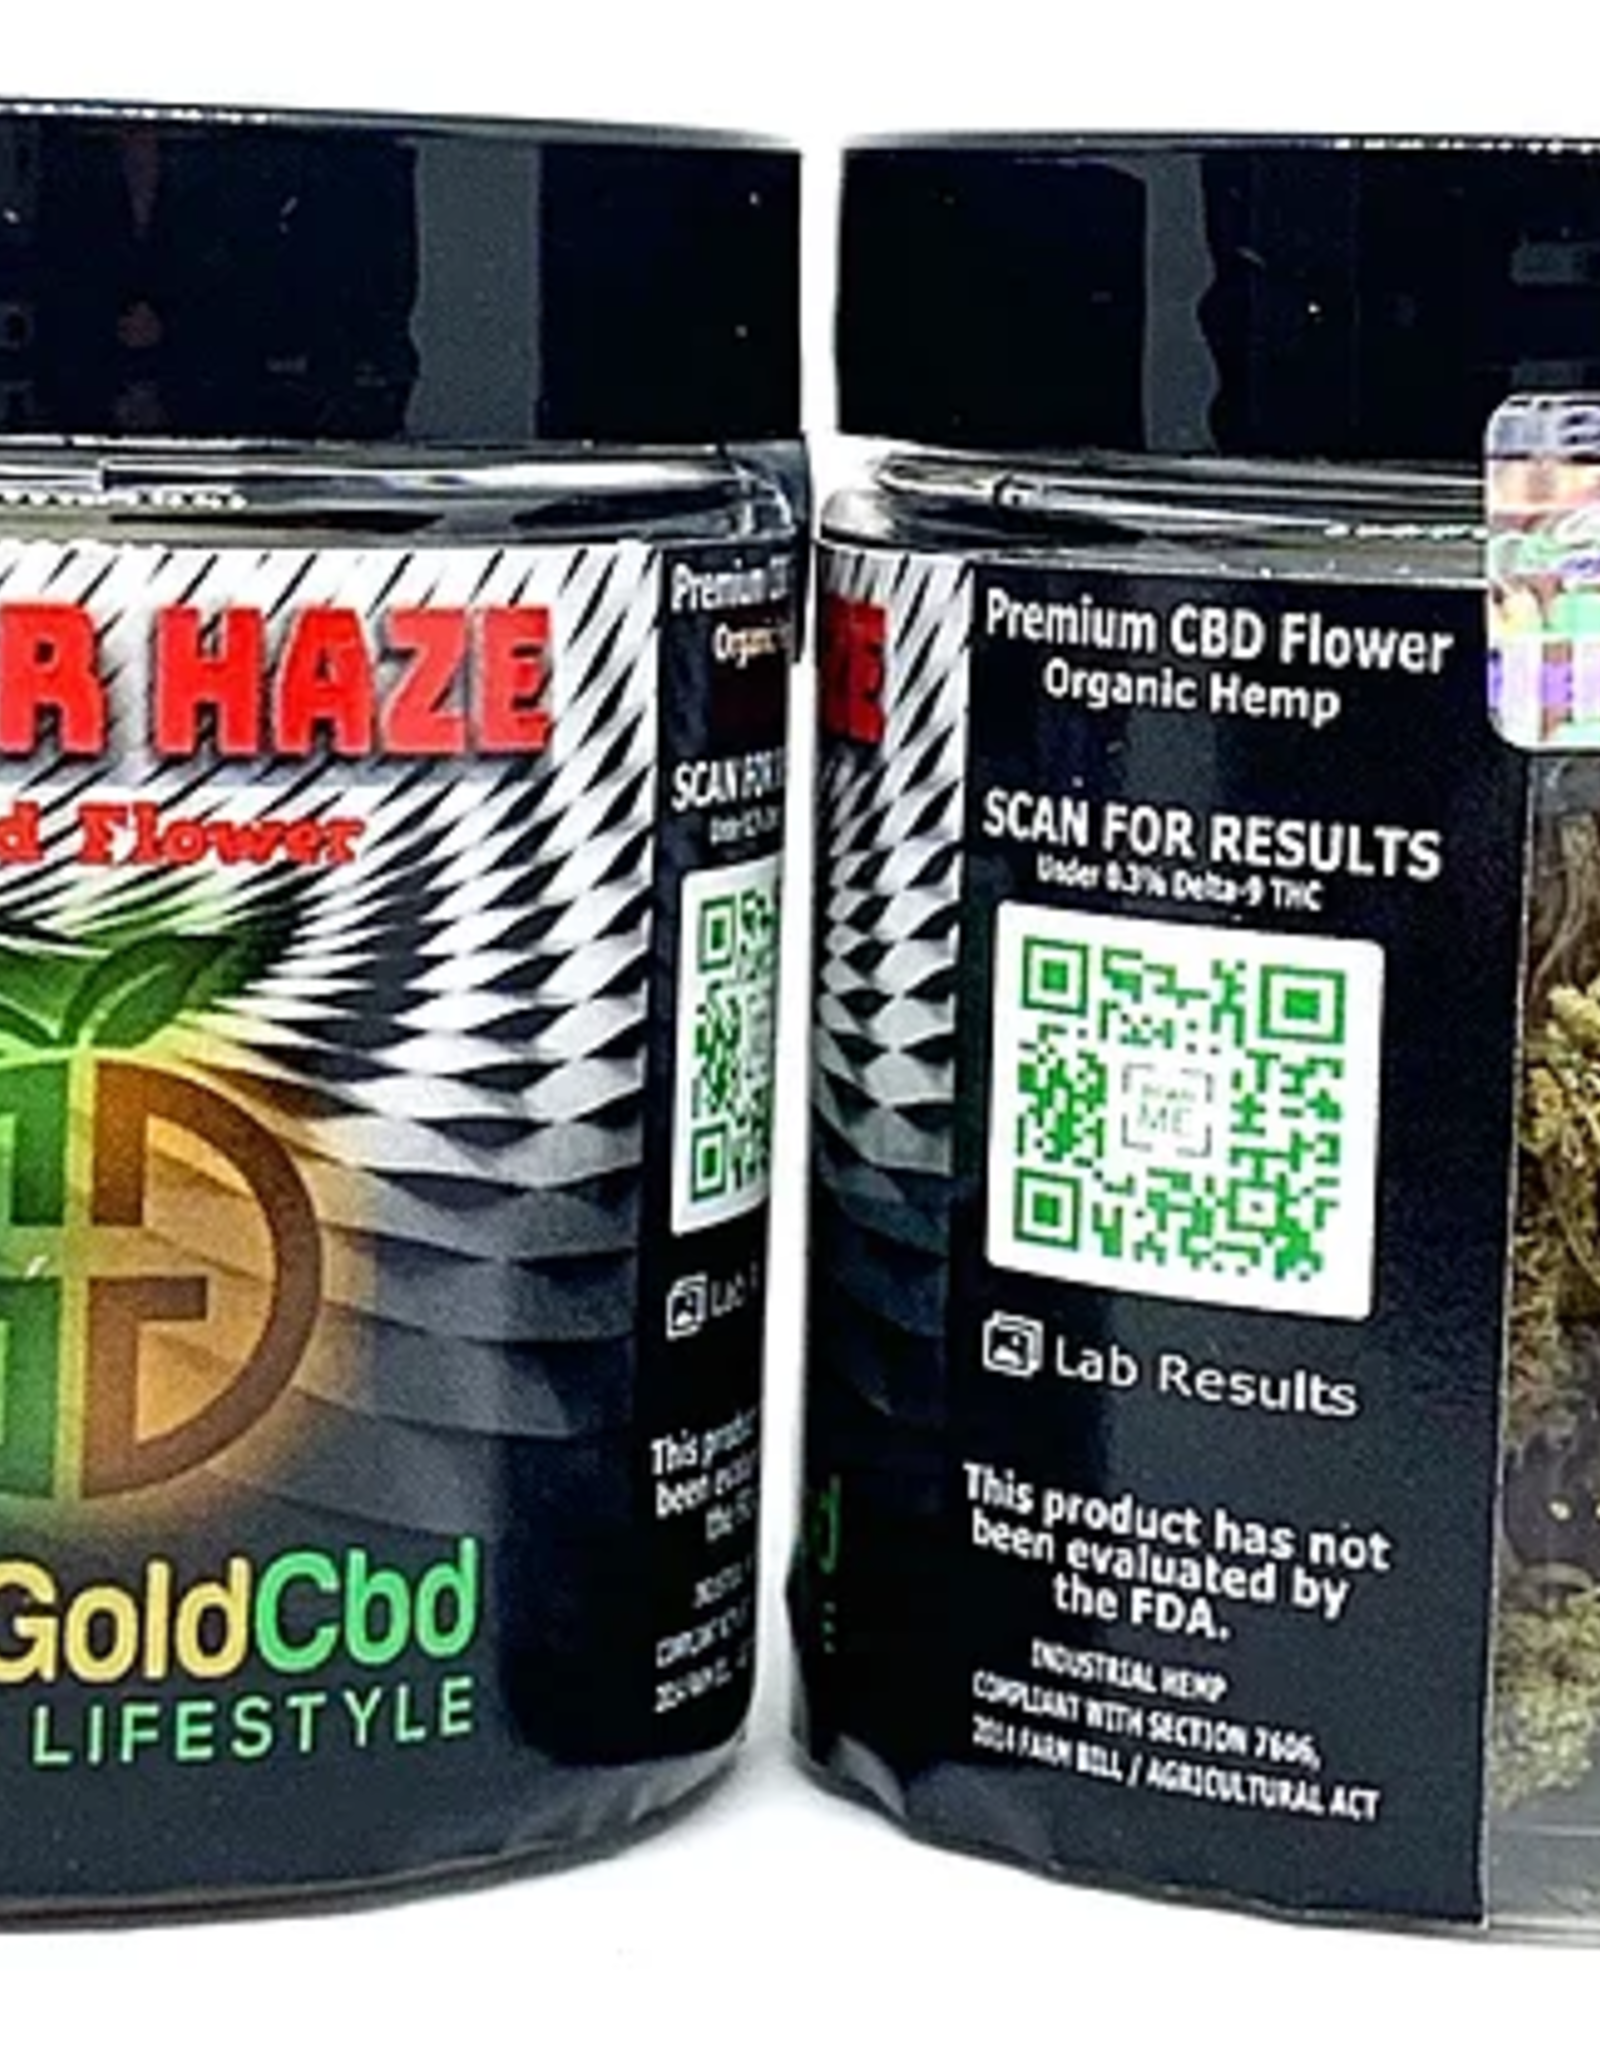 Green Gold CBD CBD Flower Suver Haze, 7g 18.9% CBD